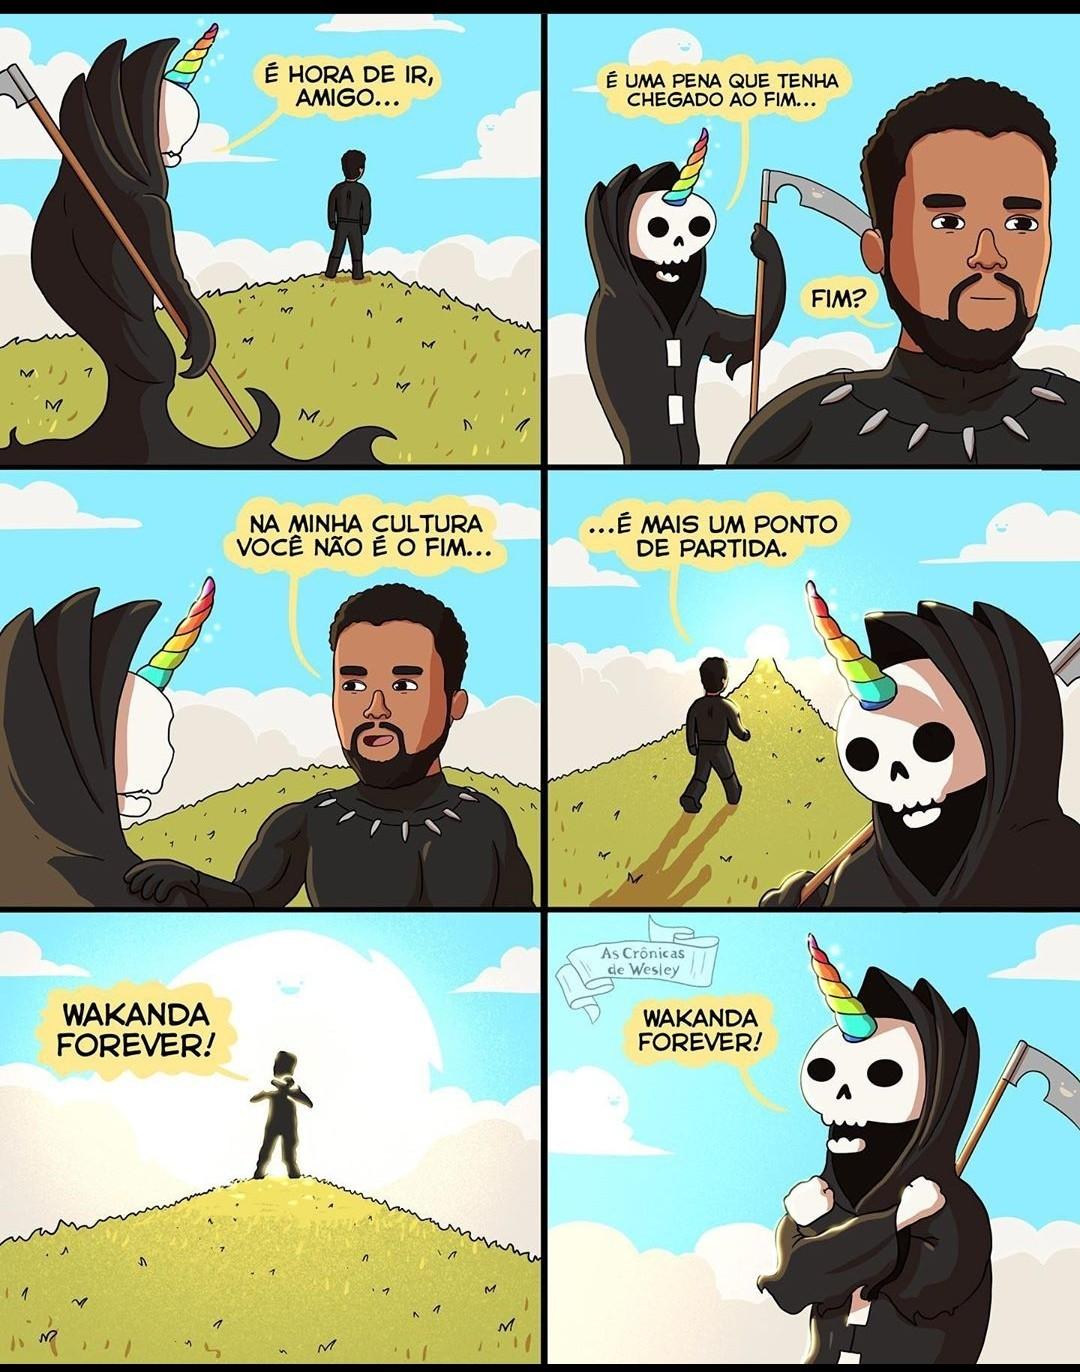 Wakanda pra sempre - meme